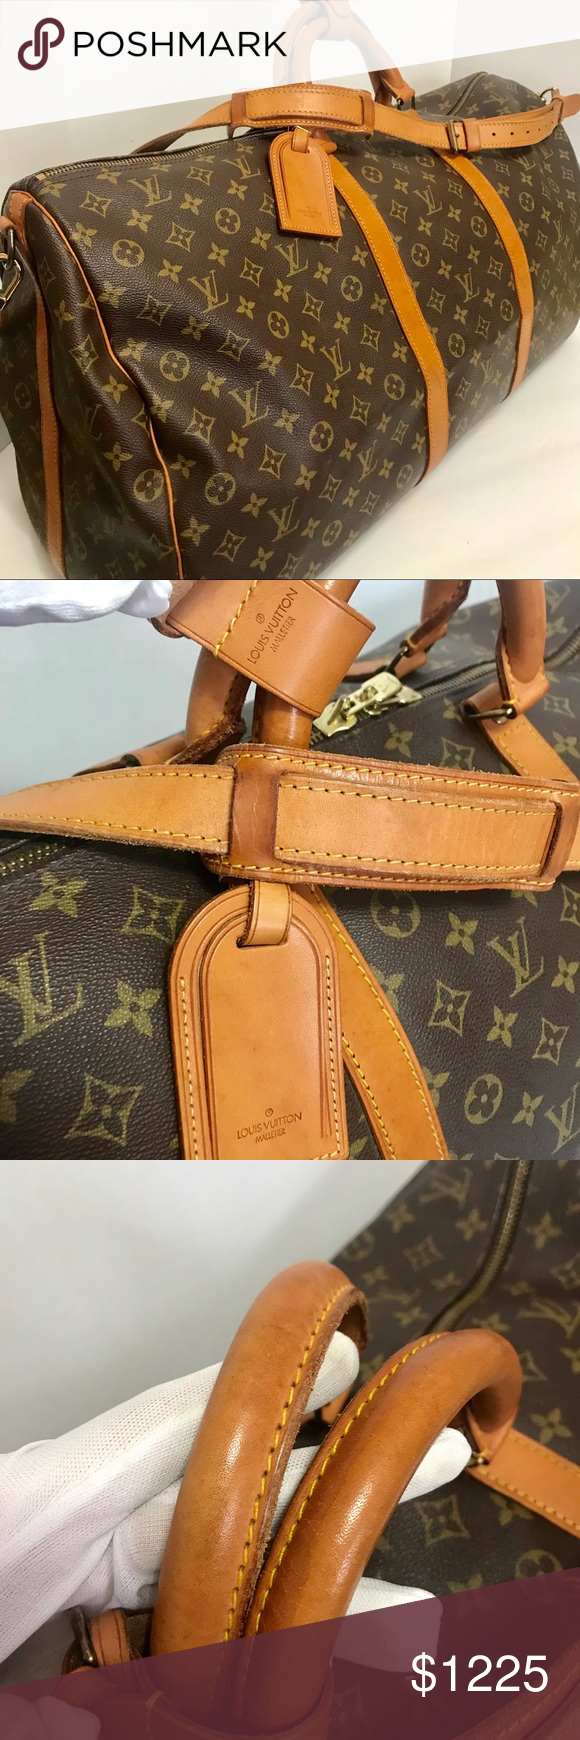 Authentic Louis Vuitton Keepall Bandouliere 60 Bag